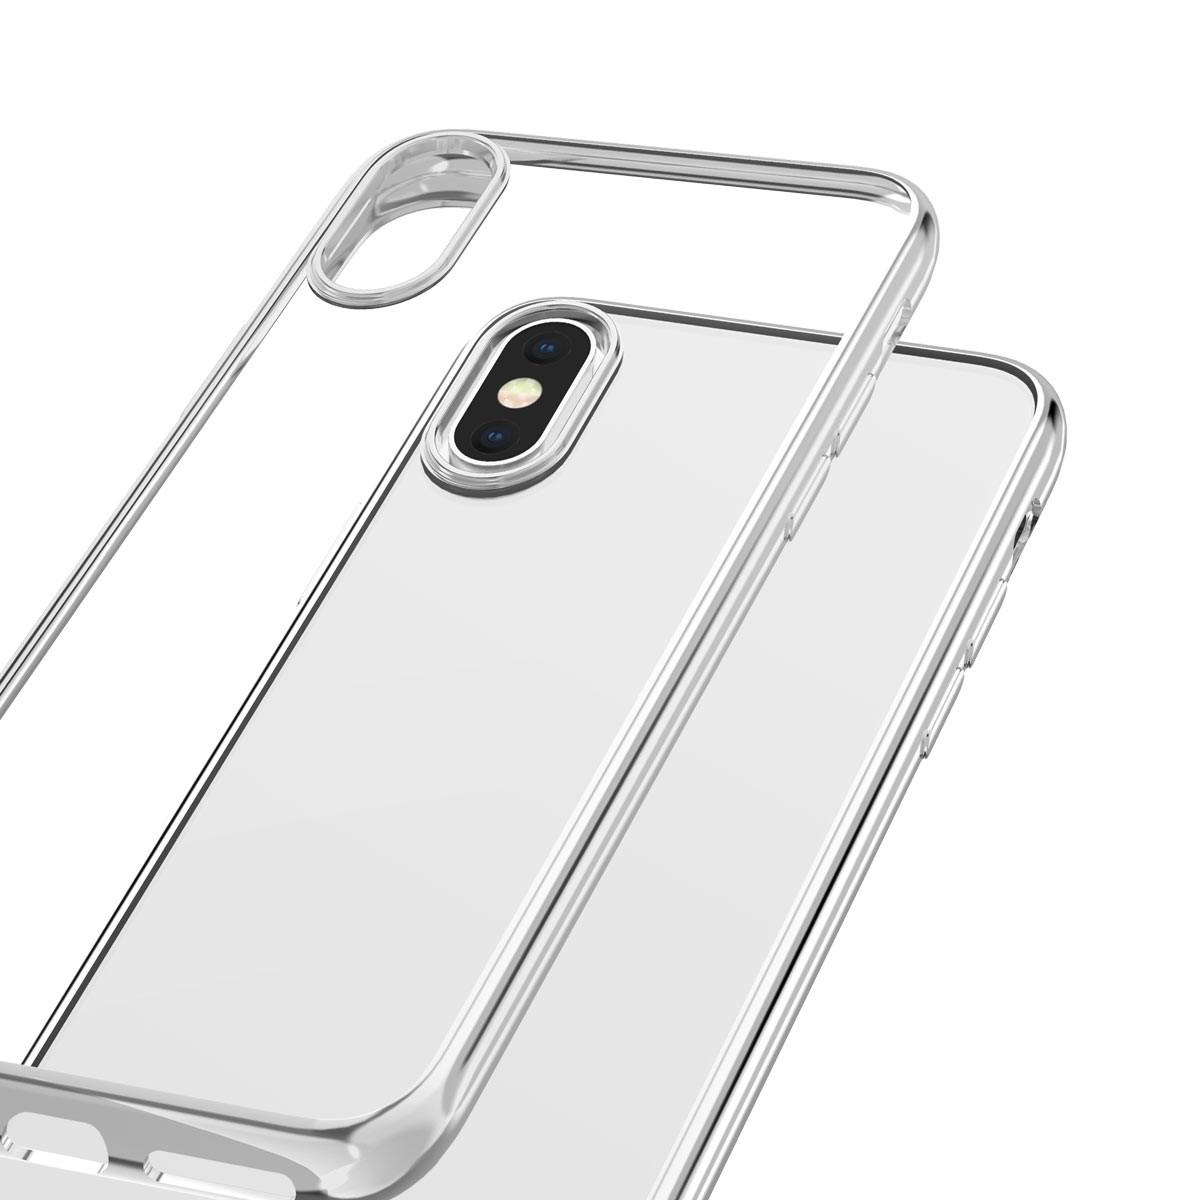 Capac protectie spate cellara colectia electro pentru iphone xs/iphone x - argintiu